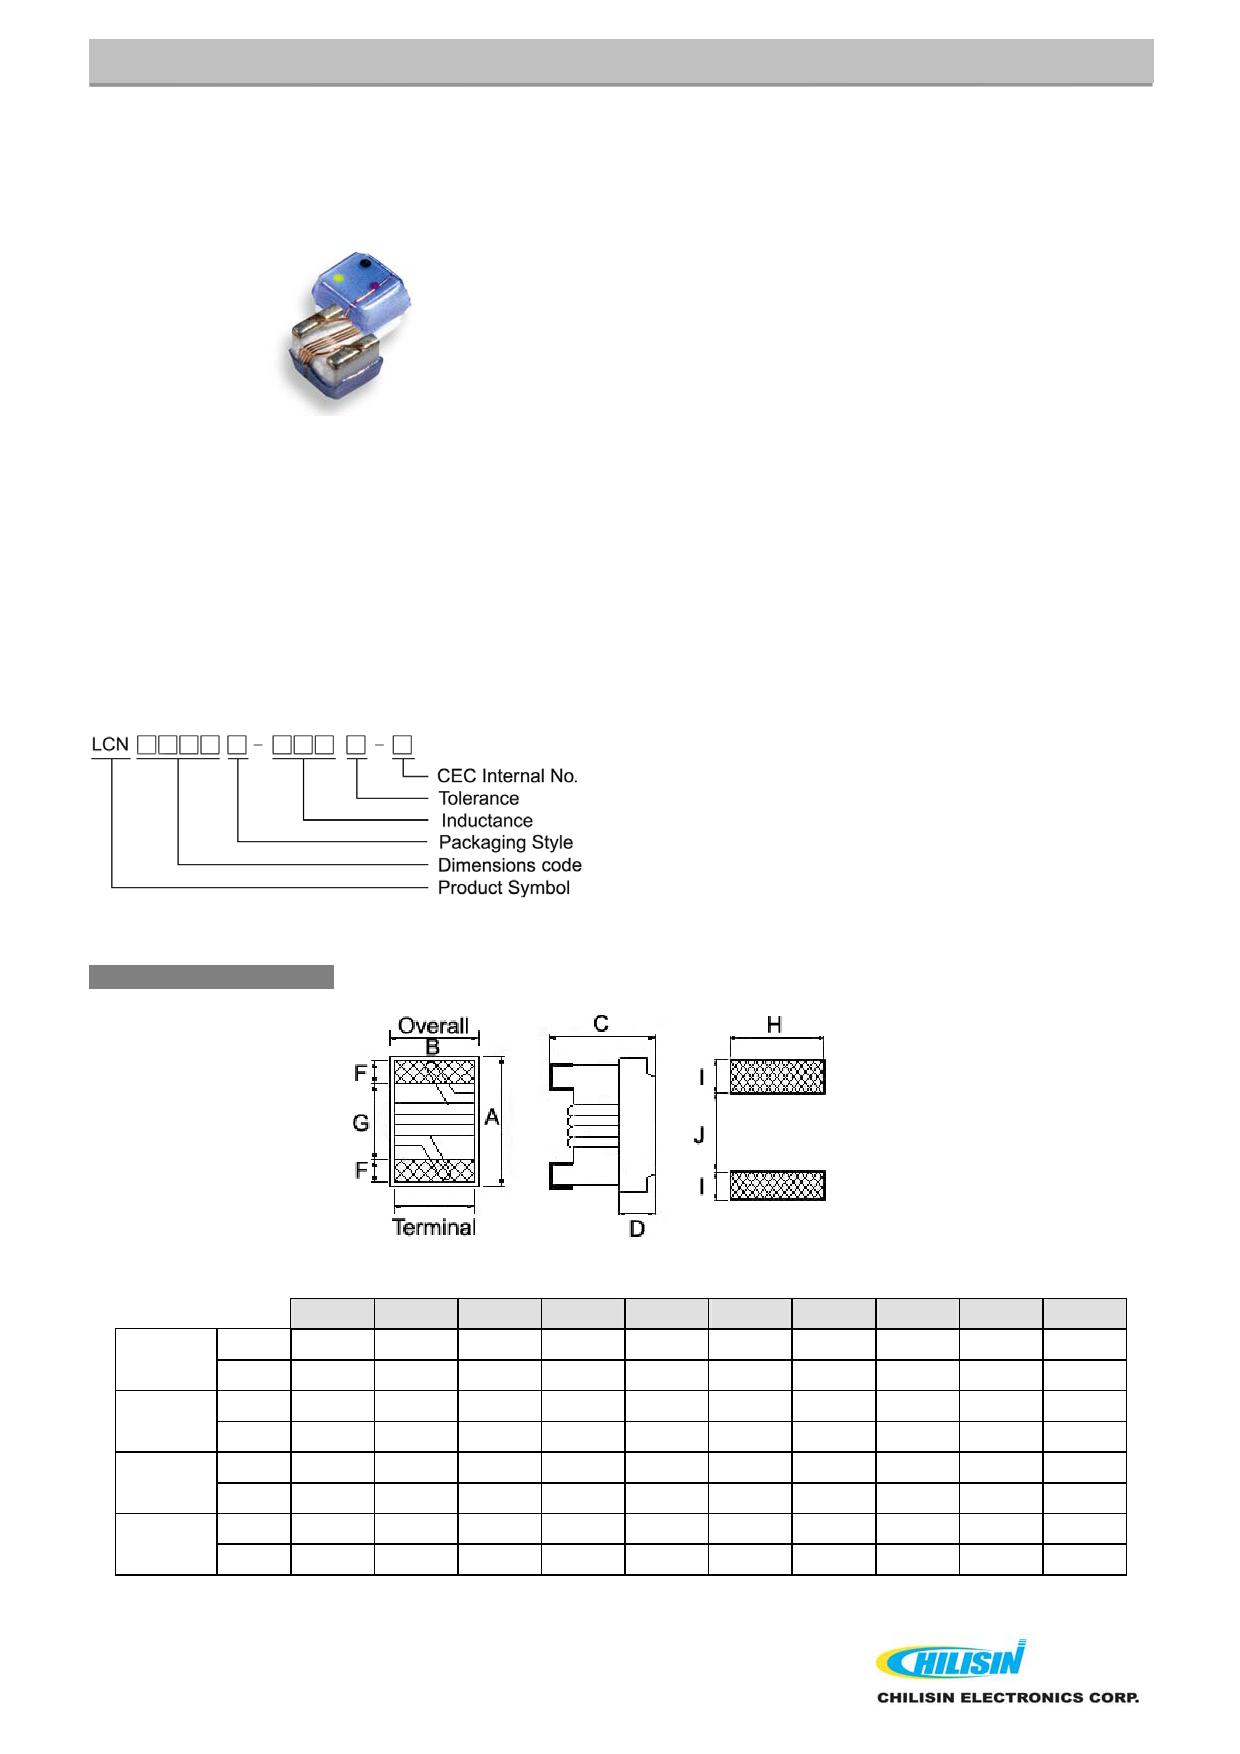 LCN0805T 데이터시트 및 LCN0805T PDF